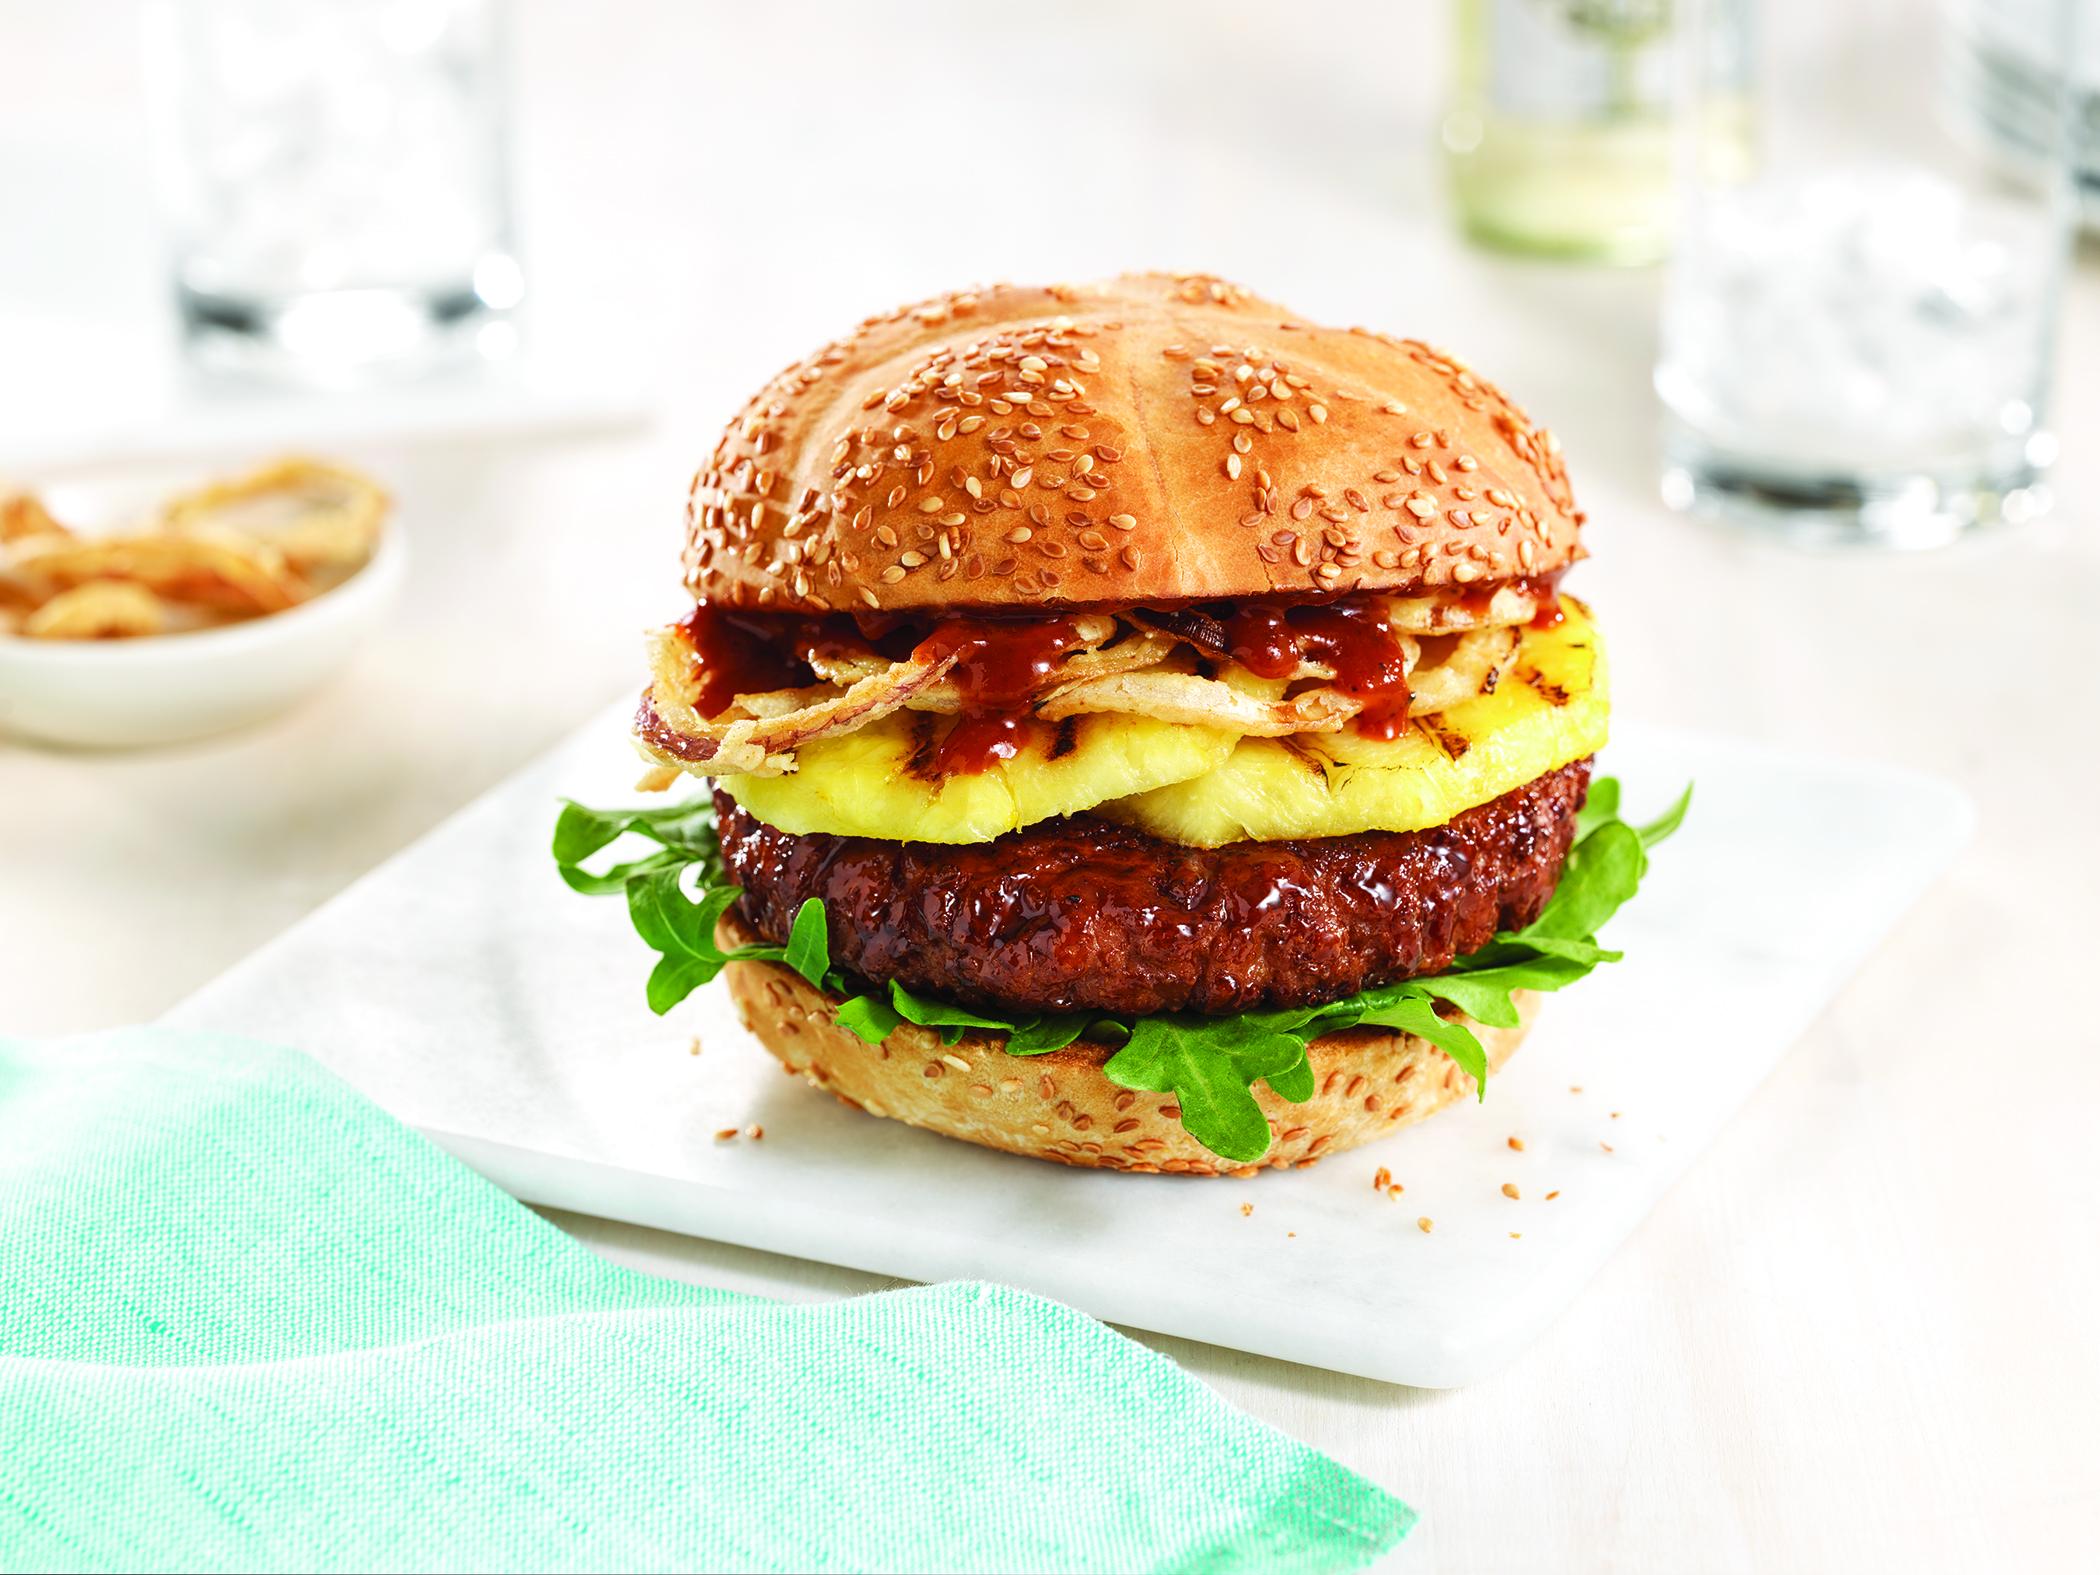 PIneapple (LIfelife)burger